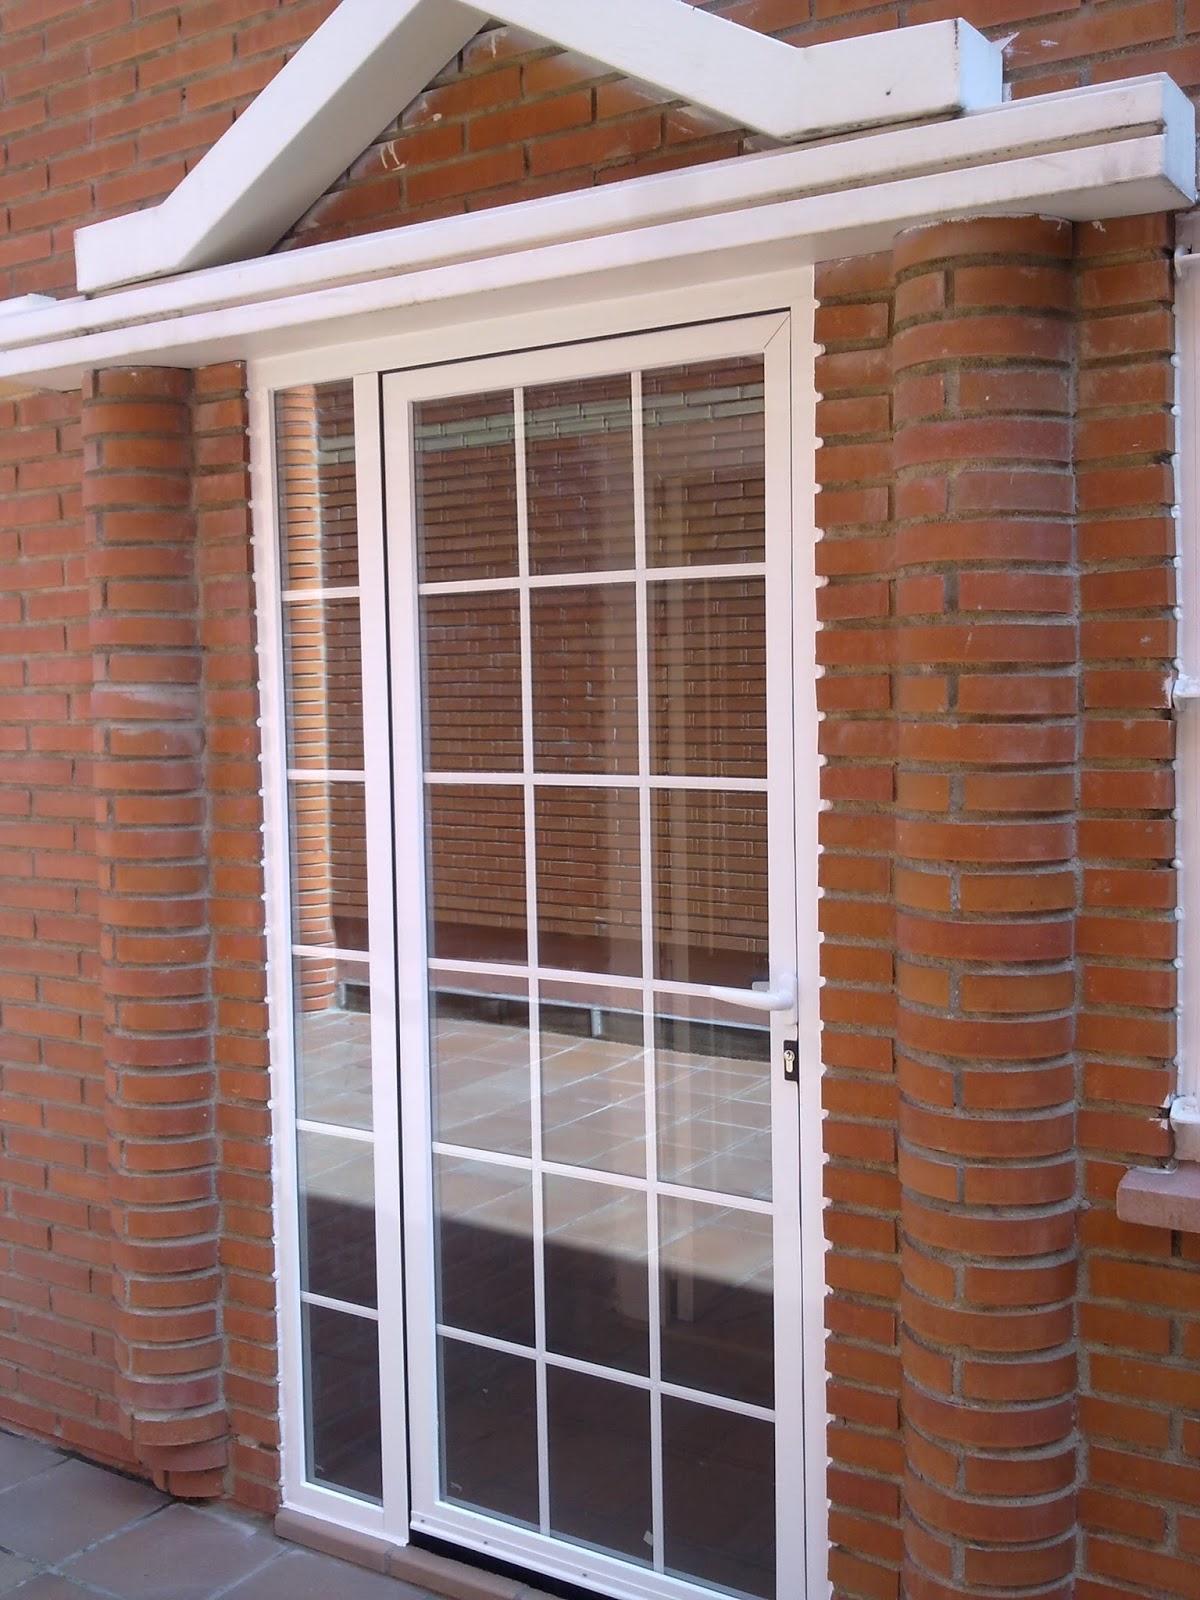 Aluminios diego fernandez serie 350 eur - Puertas acristaladas exterior ...